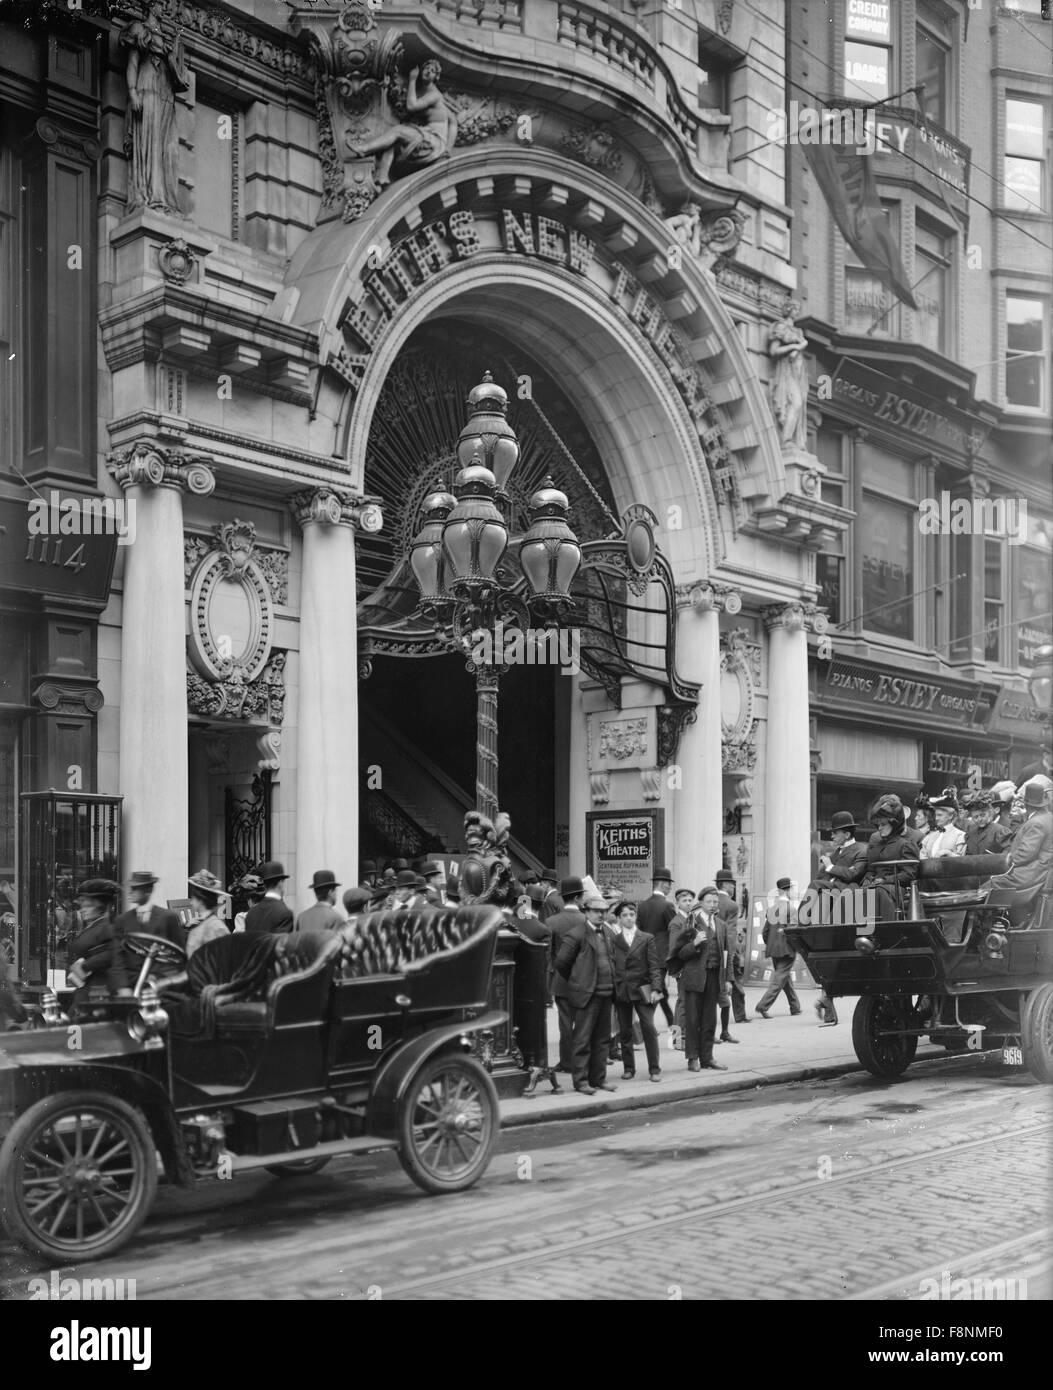 Crowd and Automobiles in front of Keith's New Theatre, Philadelphia, Pennsylvania, USA, circa 1905 - Stock Image